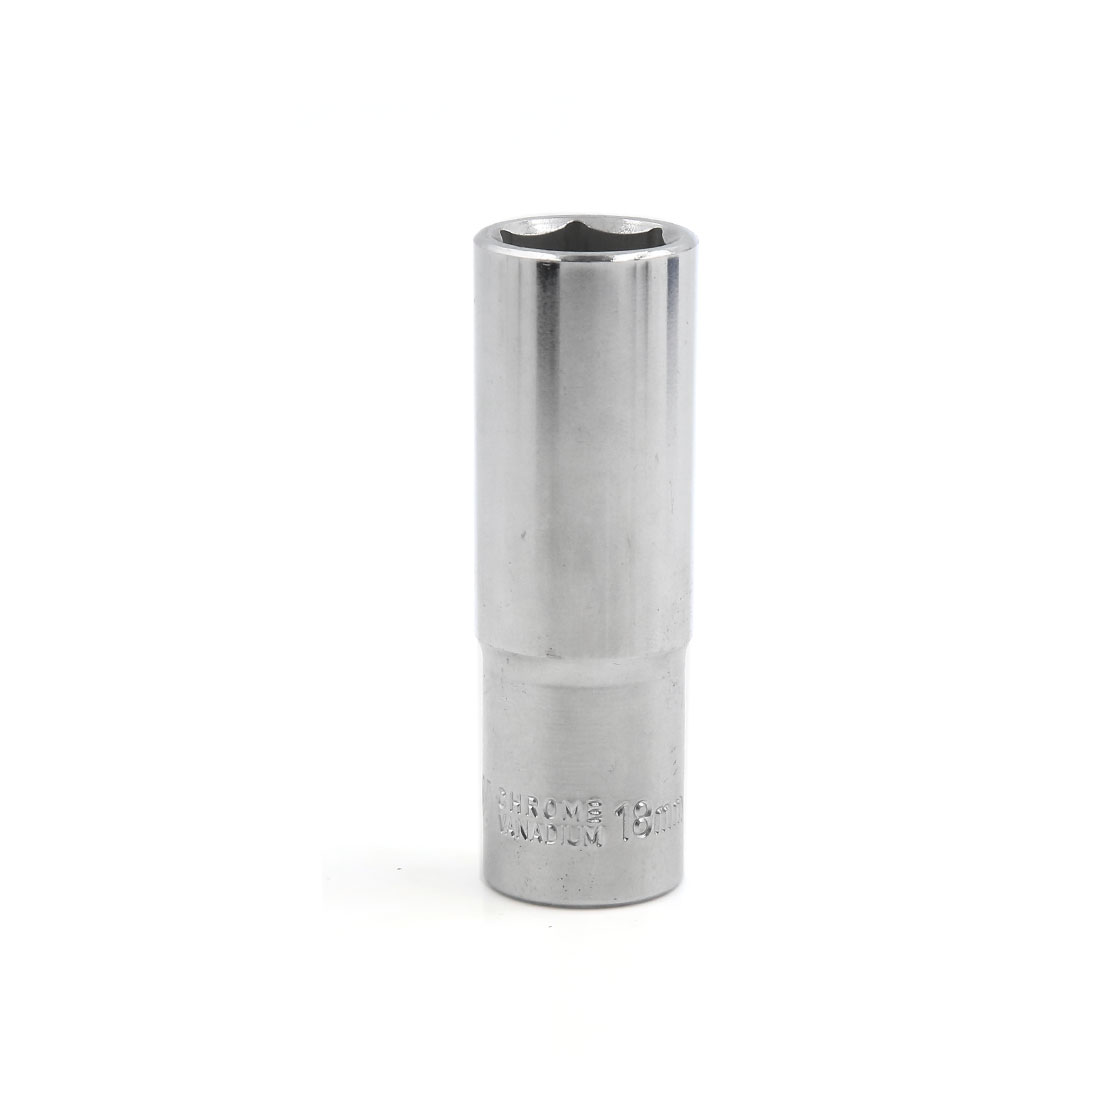 "Chrome Plated Vanadium Steel 1/2"" Square Drive 18mm Hexagon Hex Six Point Socket"